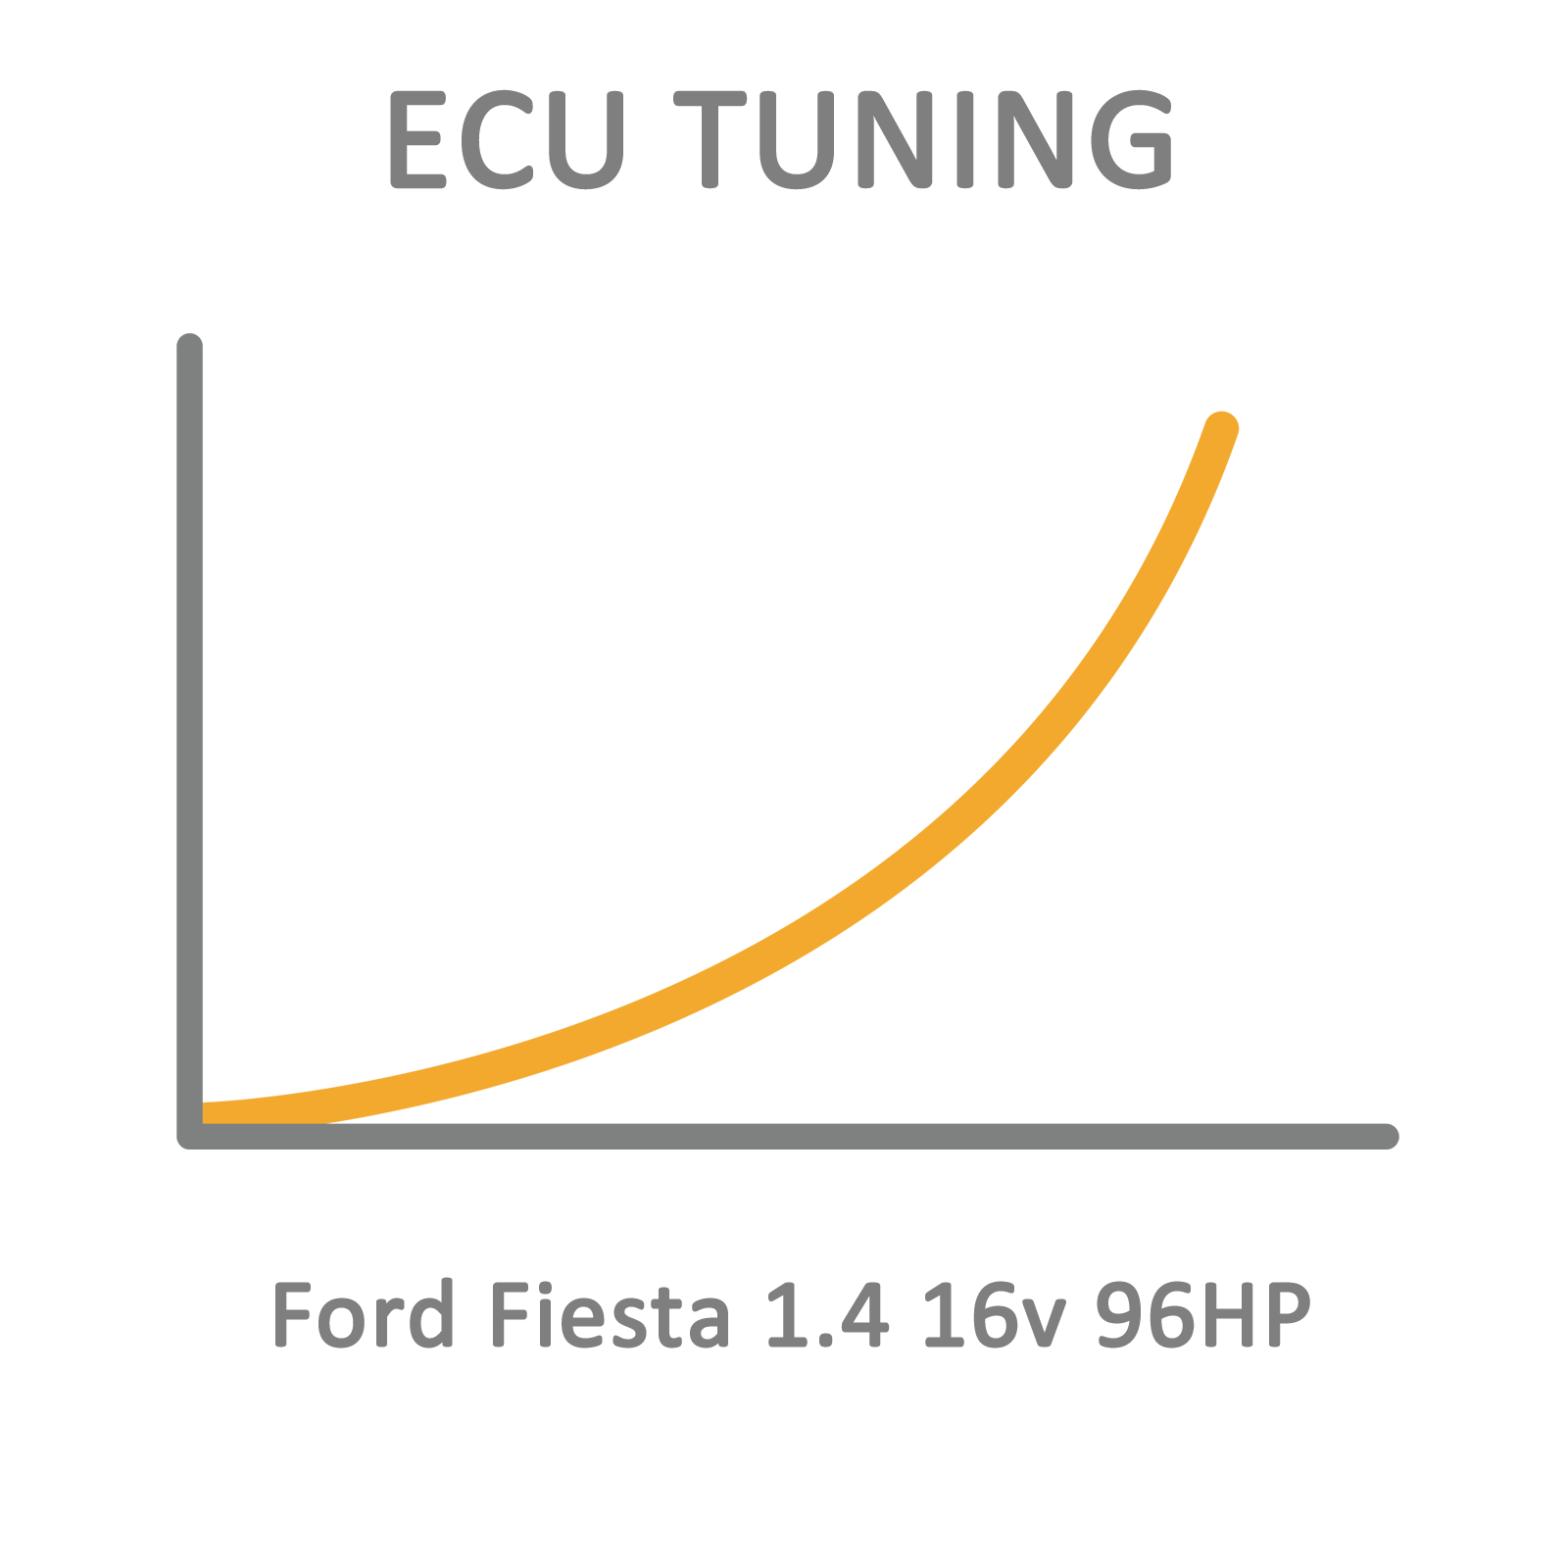 Ford Fiesta 1.4 16v 96HP ECU Tuning Remapping Programming